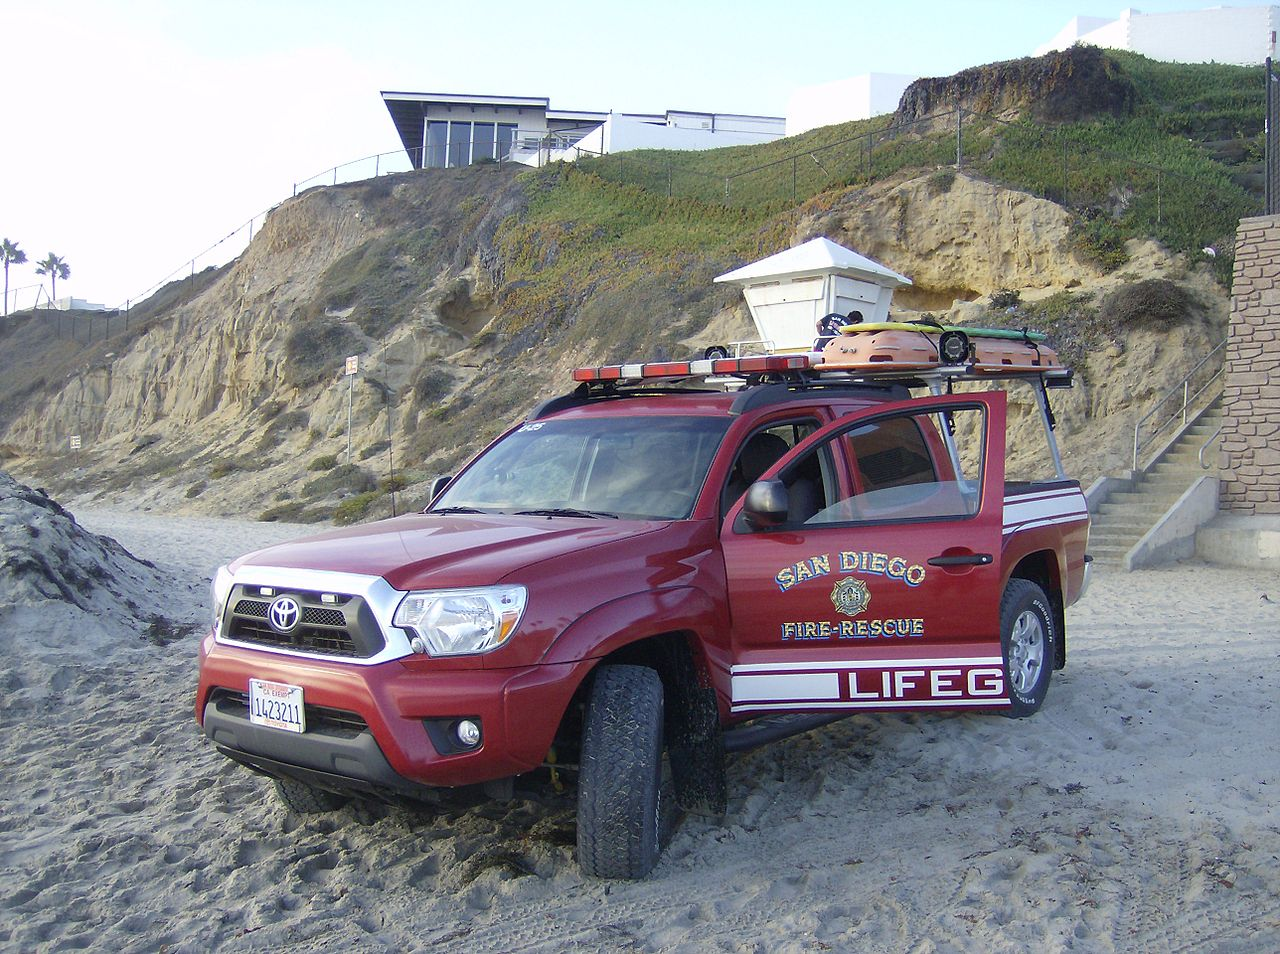 File:SDFD Lifeguard truck JPG - Wikimedia Commons